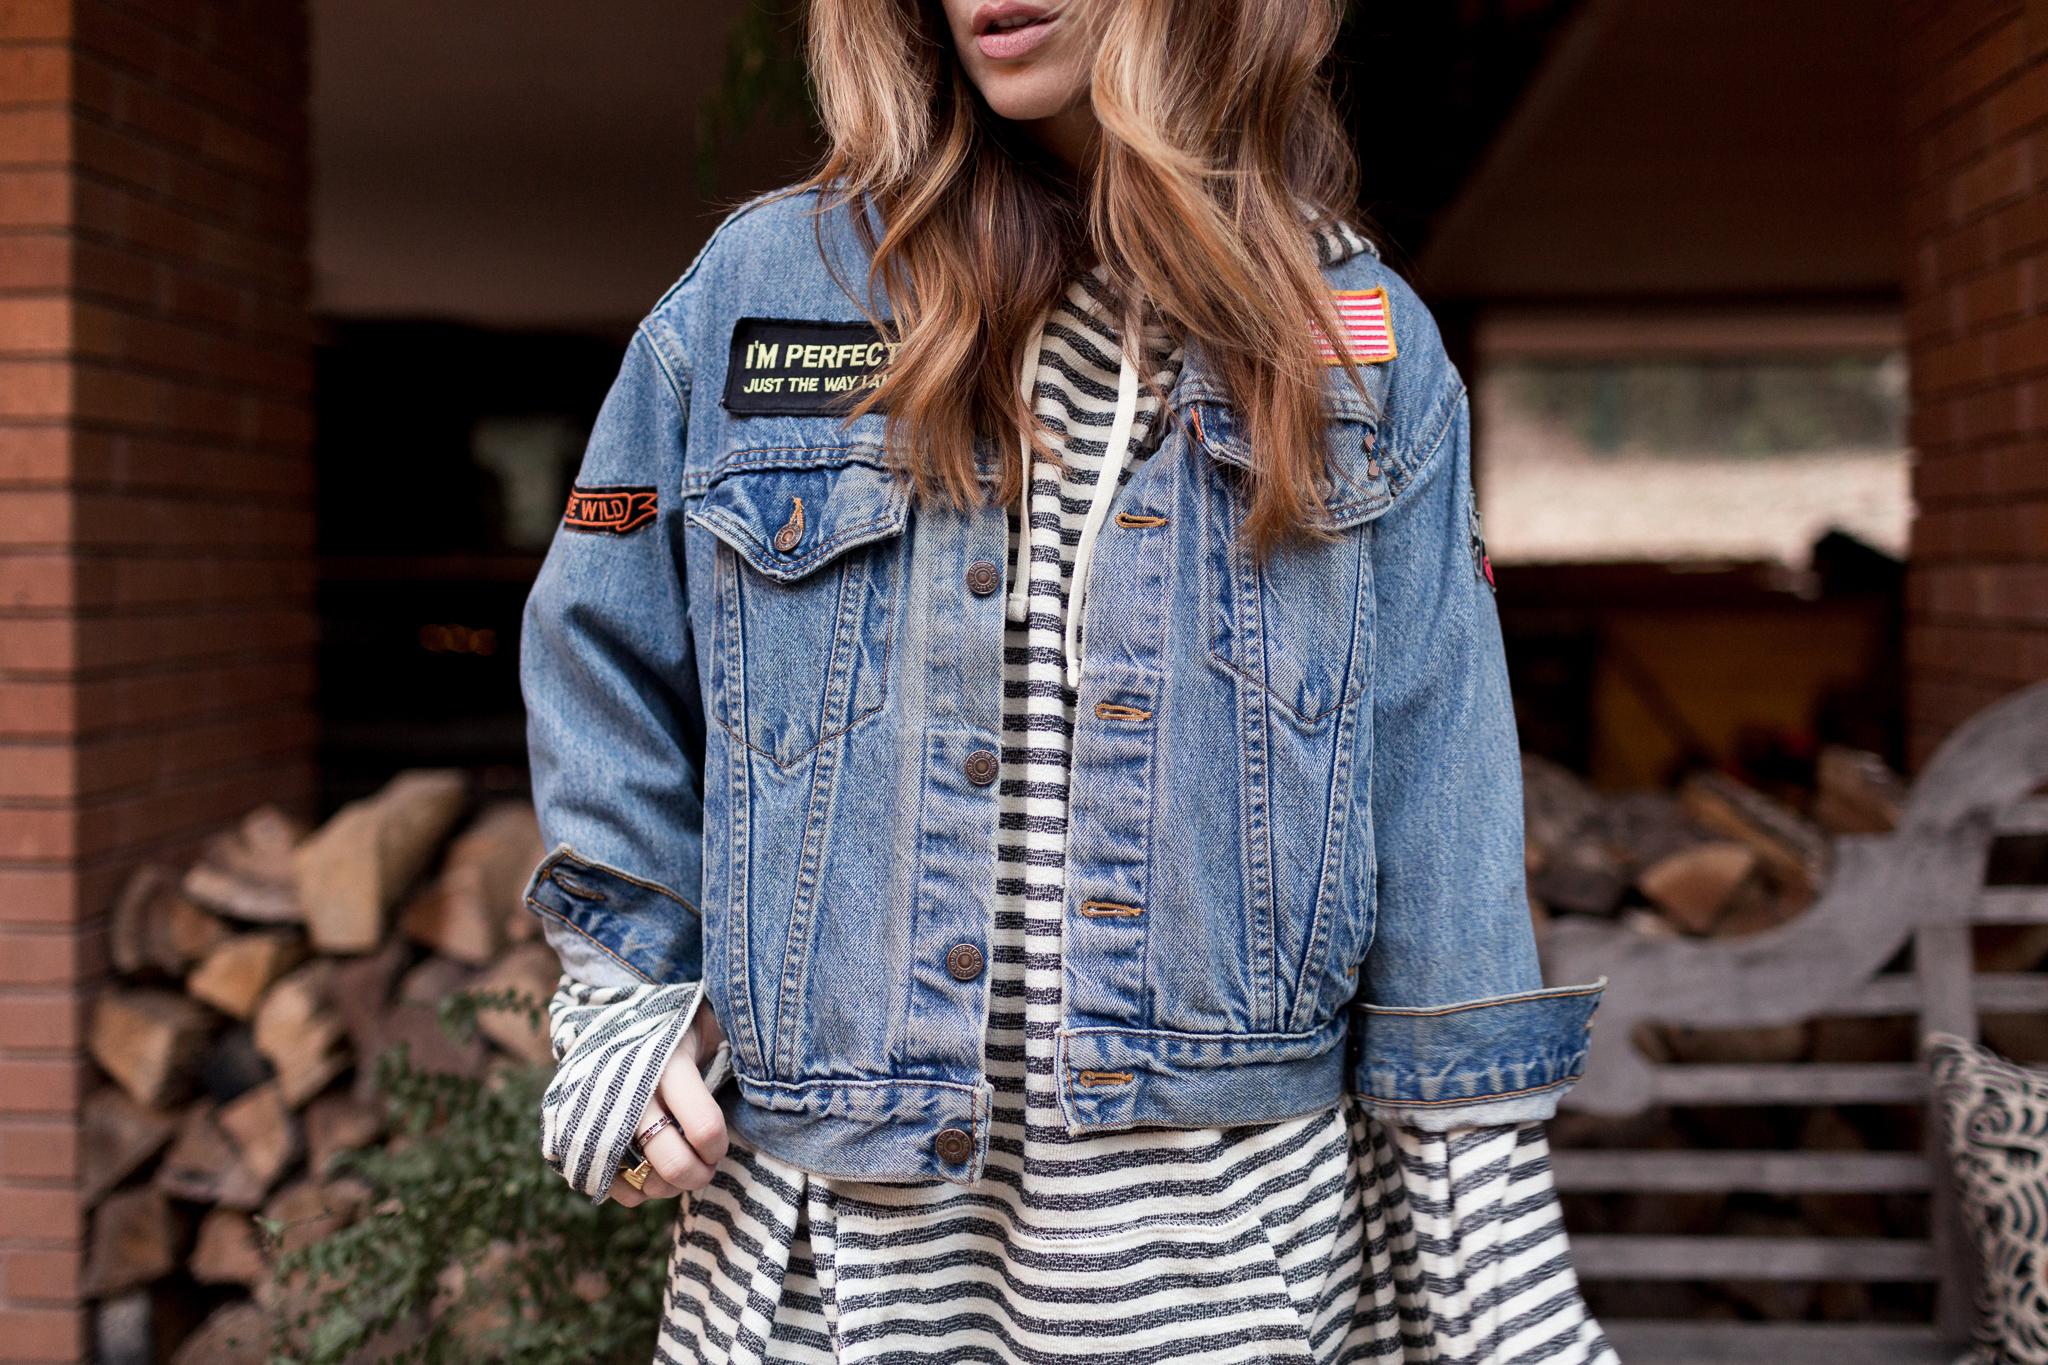 Eldridge Edit-Anna_Cottrell_Fashion_Blogger_Winter_2017_Jean_Denim_Jacket_Patches_Striped_Oversized_Hoodie_Ralph_Lauren_Black_Over_the_Knee_OTK_Boots_MGB_Photo_1.jpg